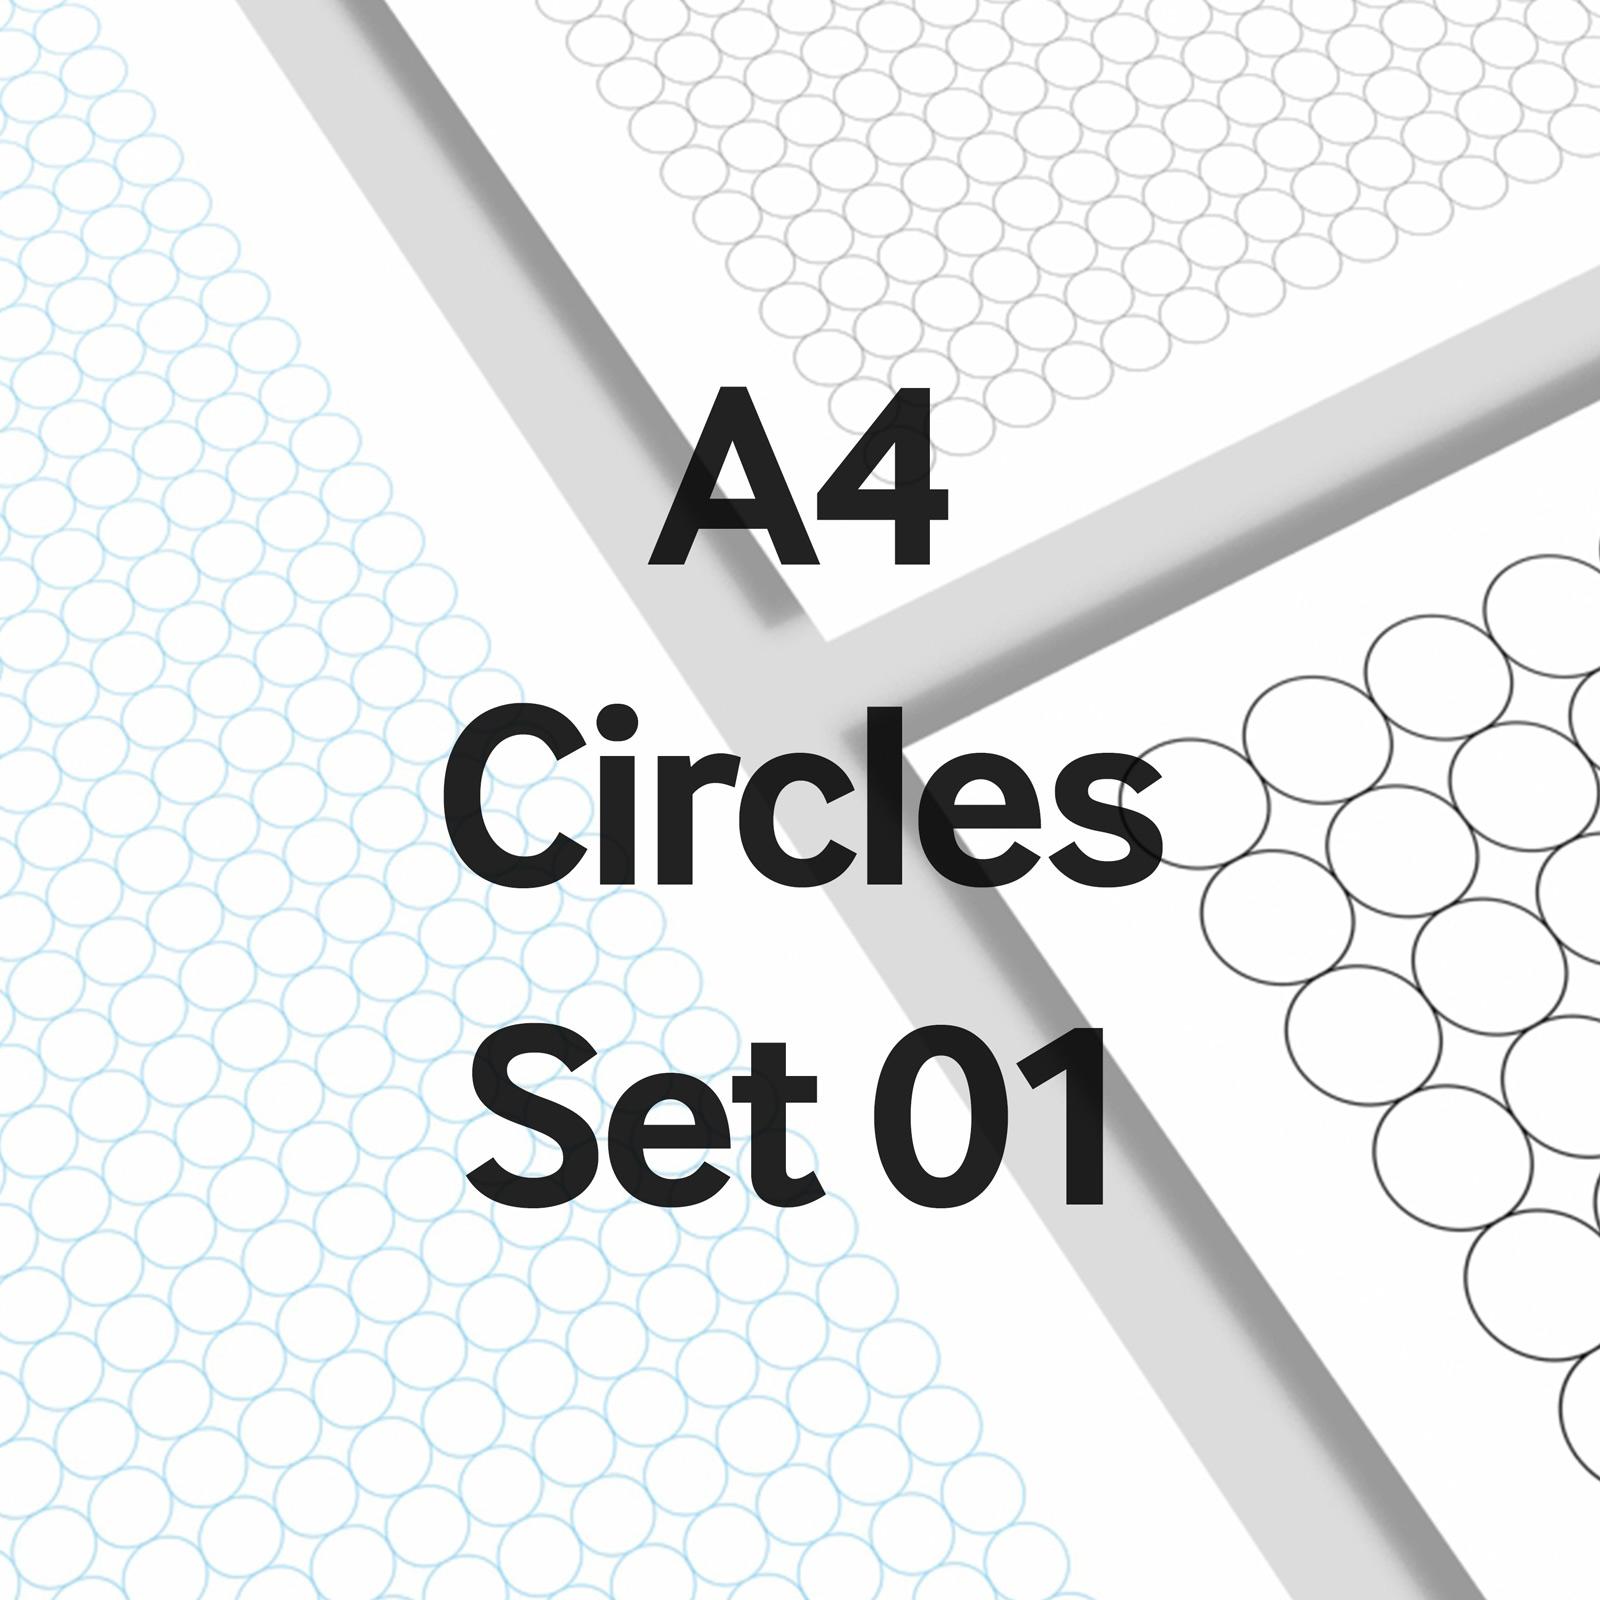 We Love Grids® A4 Circles Set 01